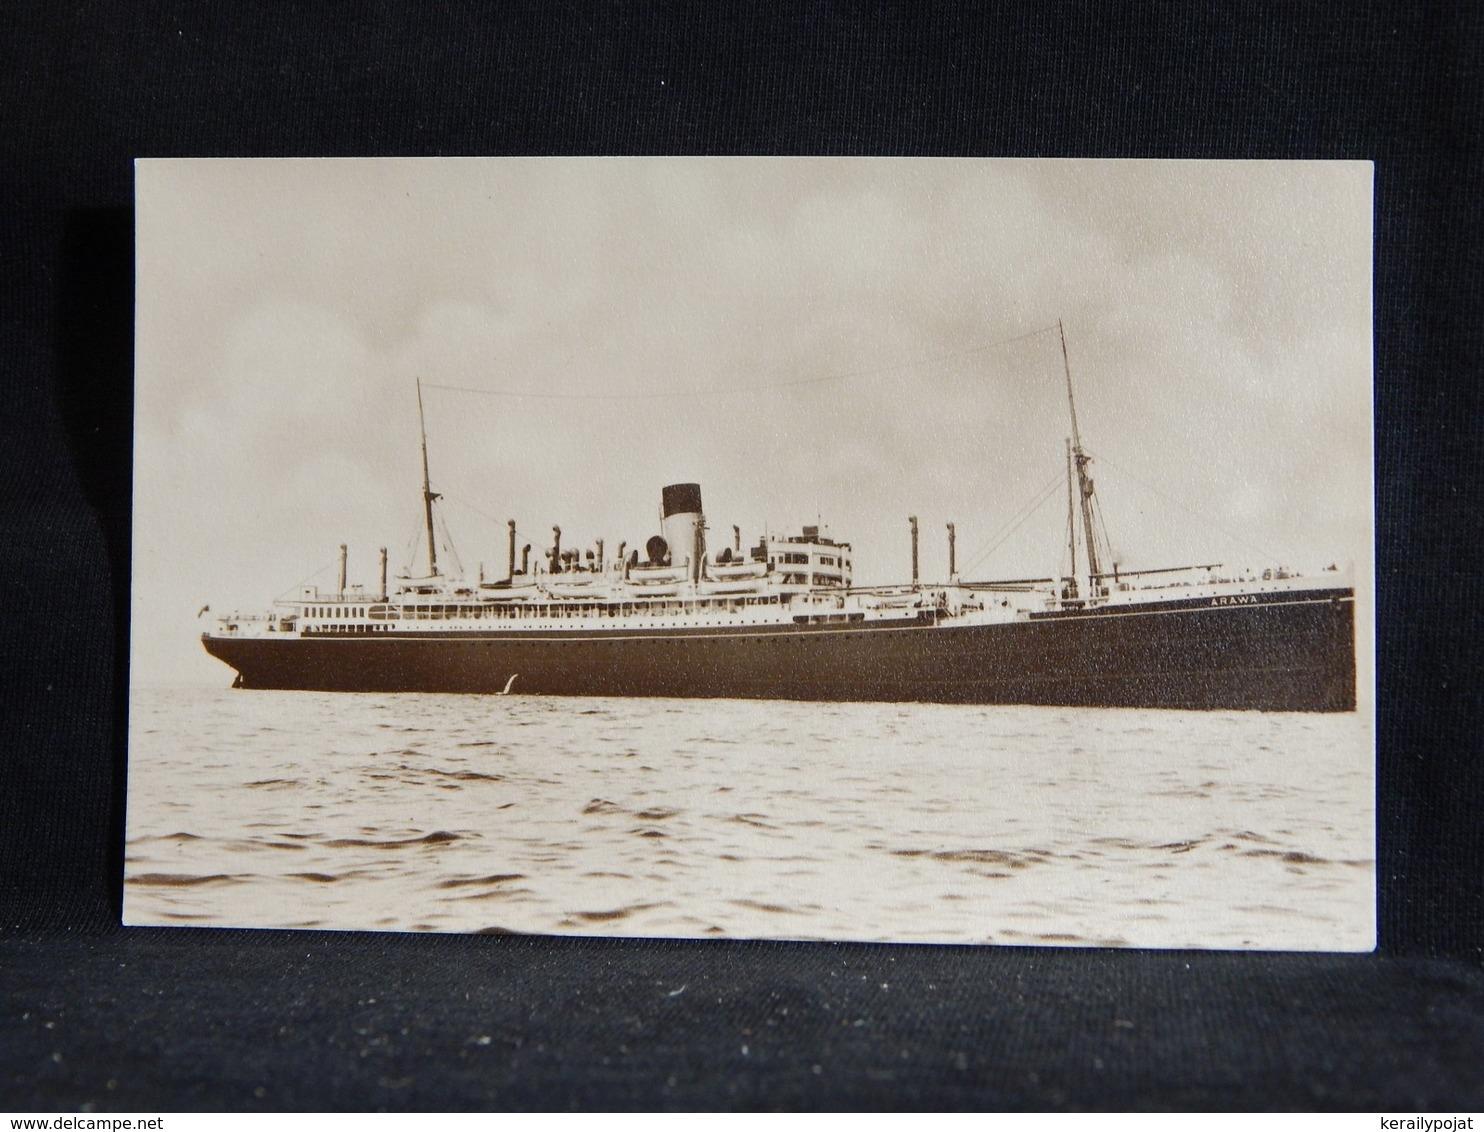 Steamer S.S. Arawa__(22715) - Paquebote